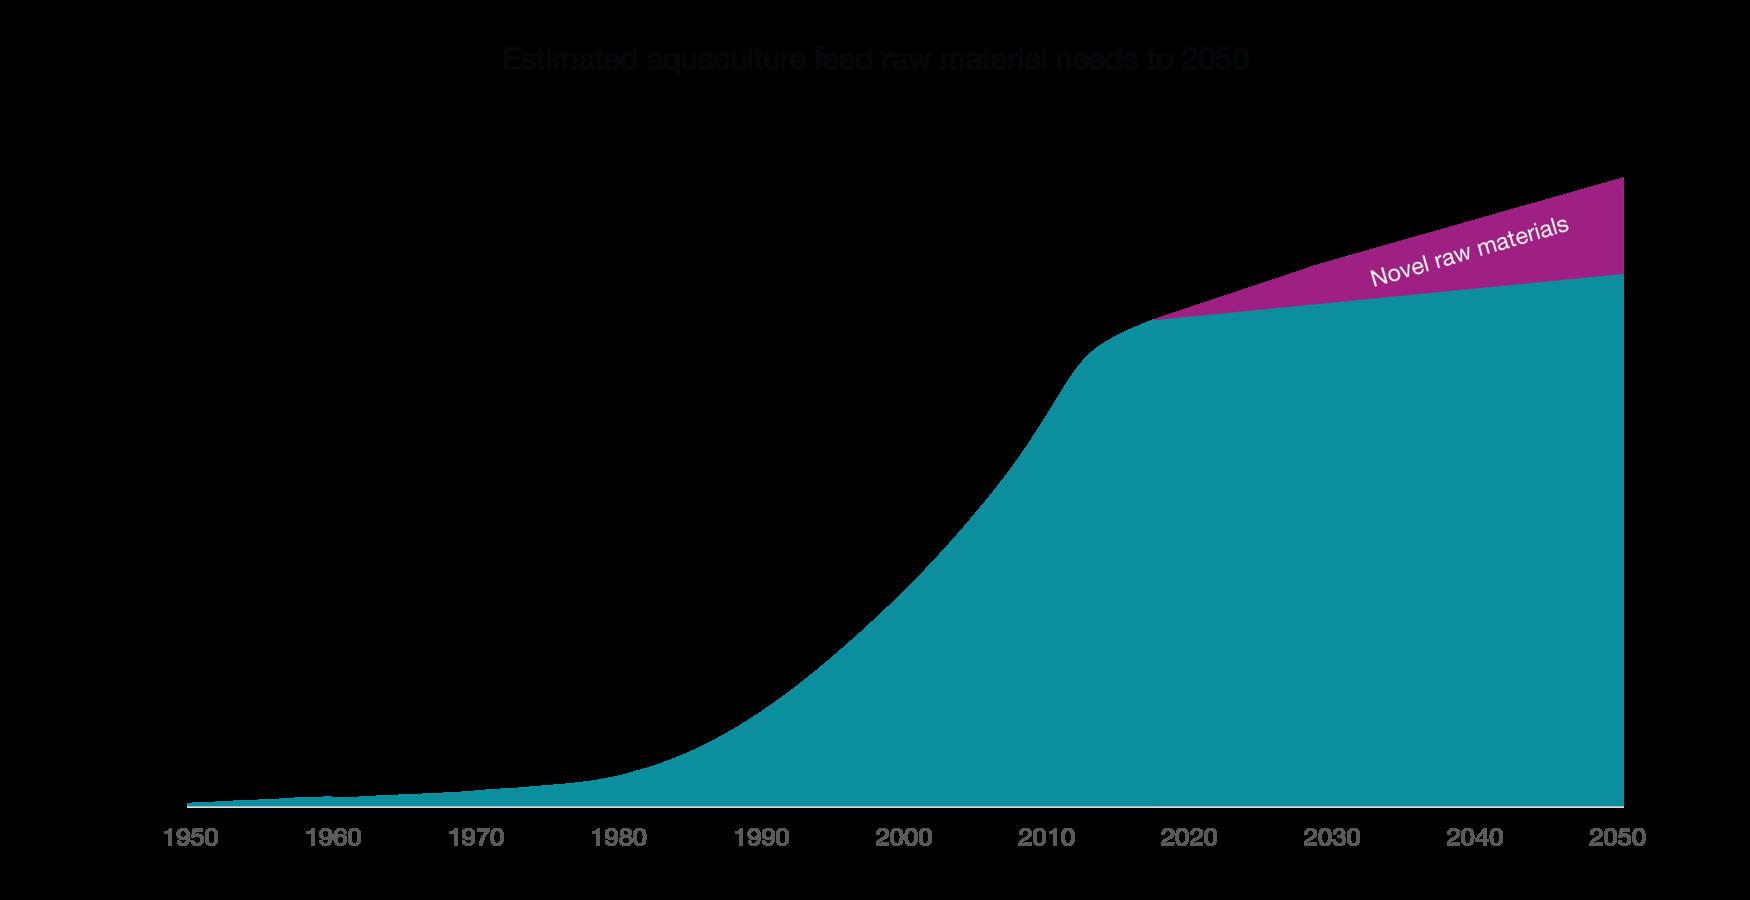 RM needs to 2050